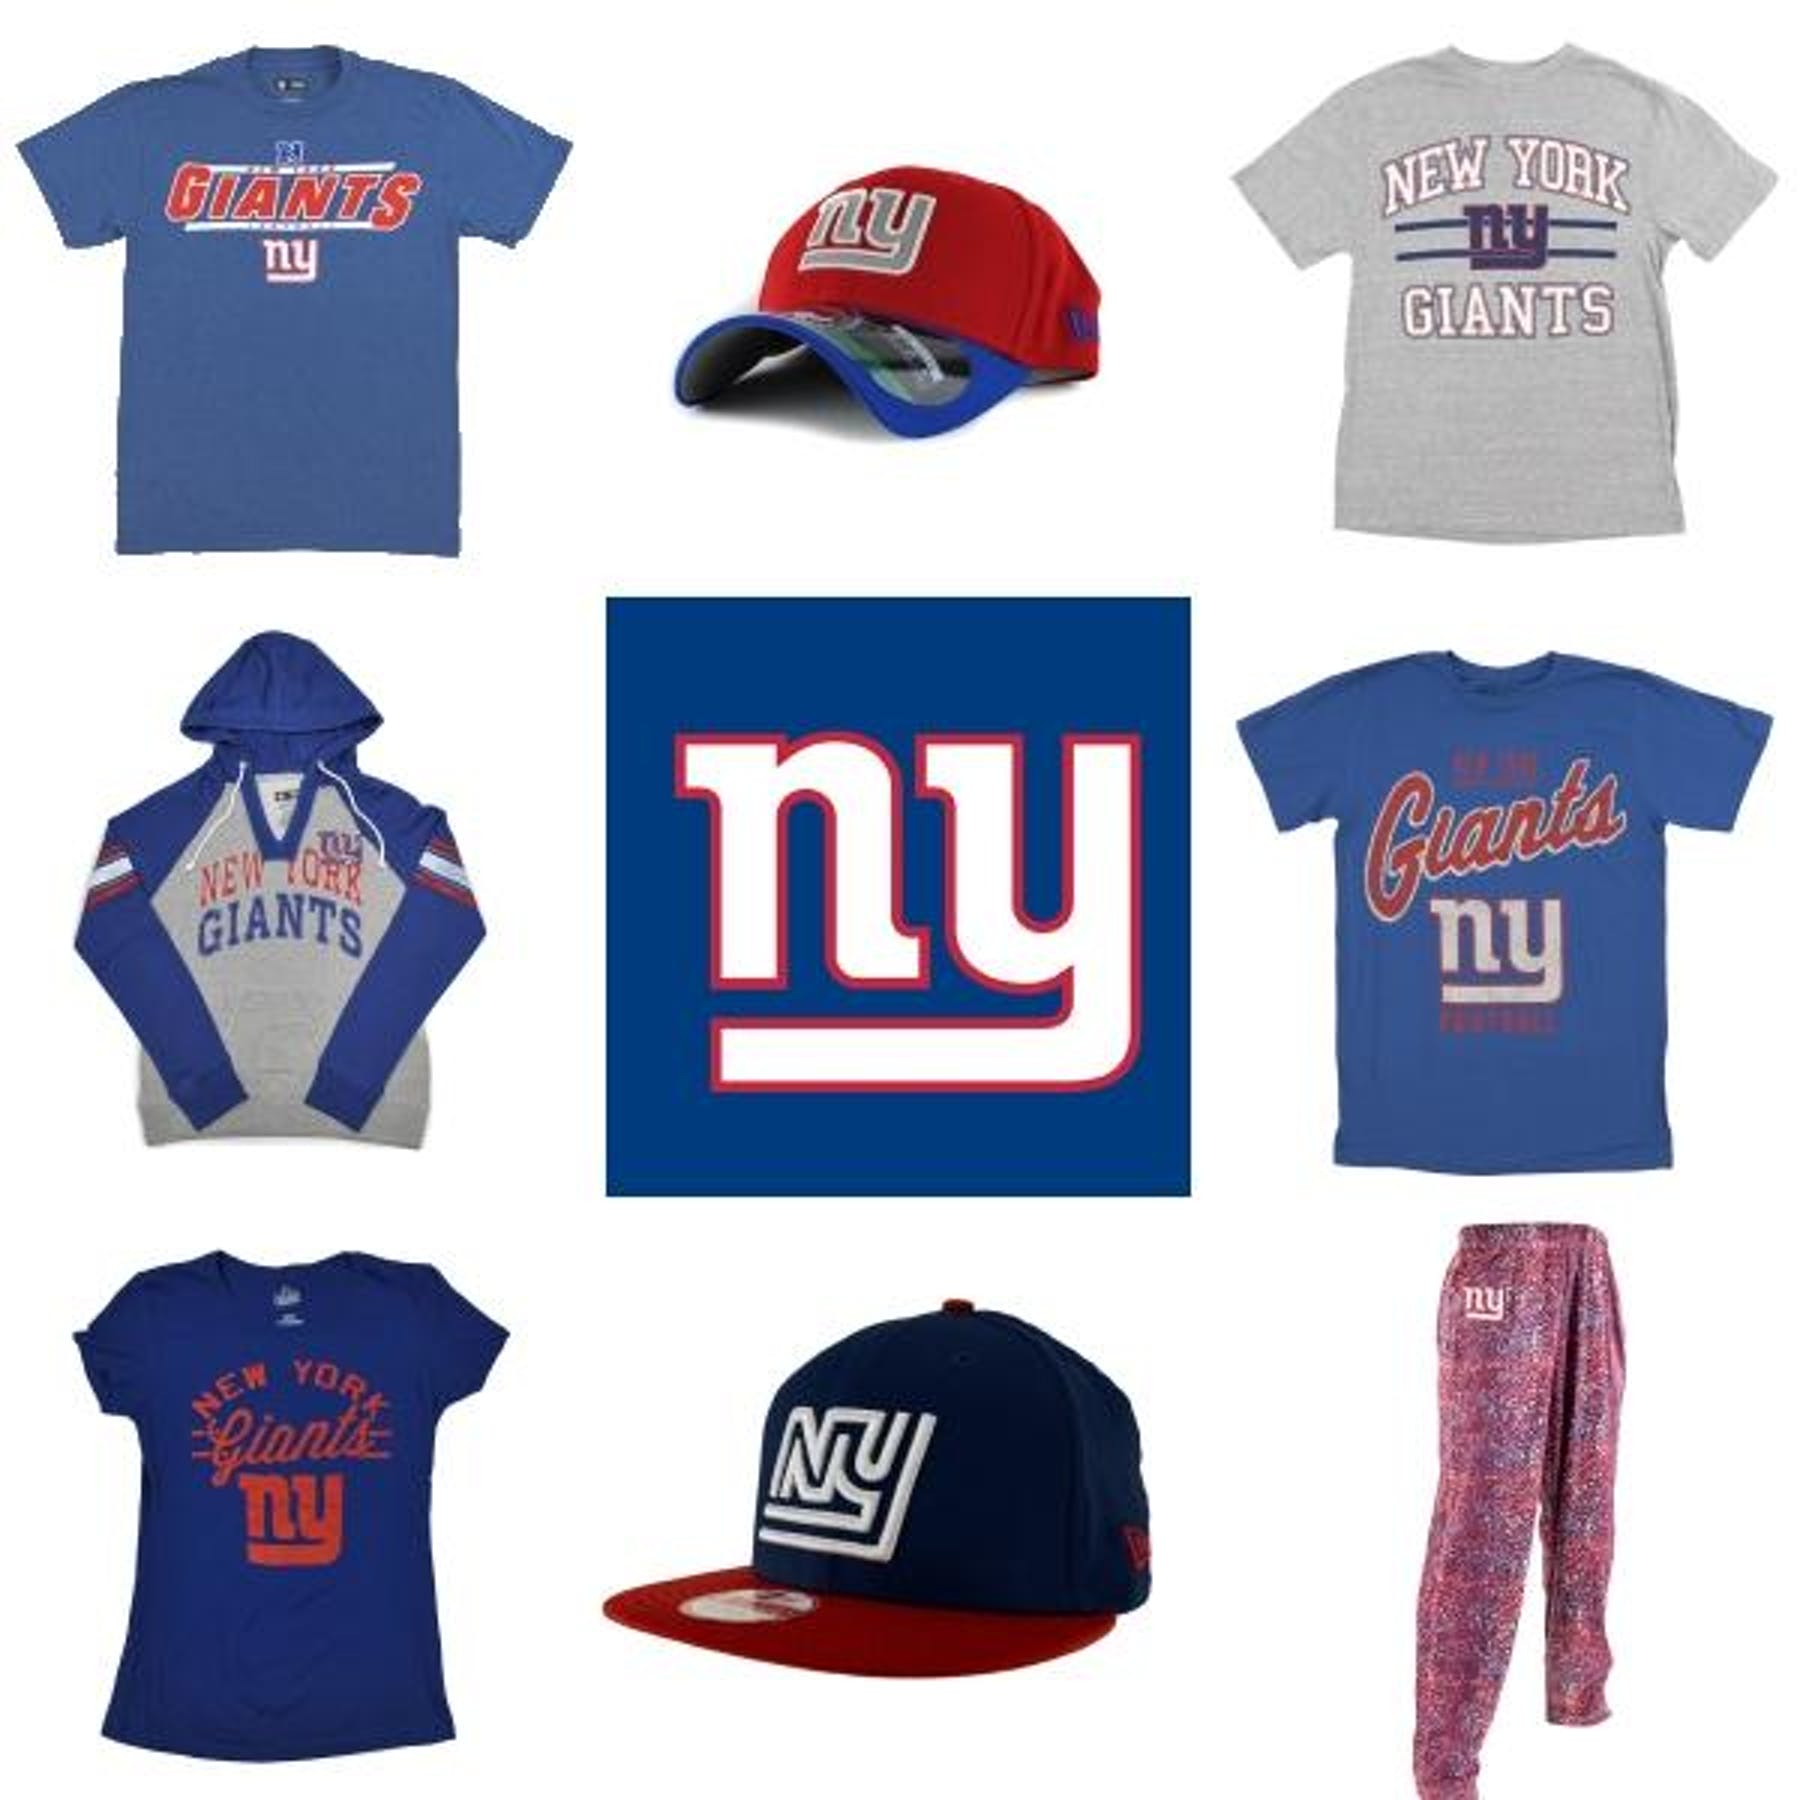 33f311b4 New York Giants Officially Licensed NFL Apparel Liquidation - 340+ Items,  $14,300+ SRP! | DA Card World